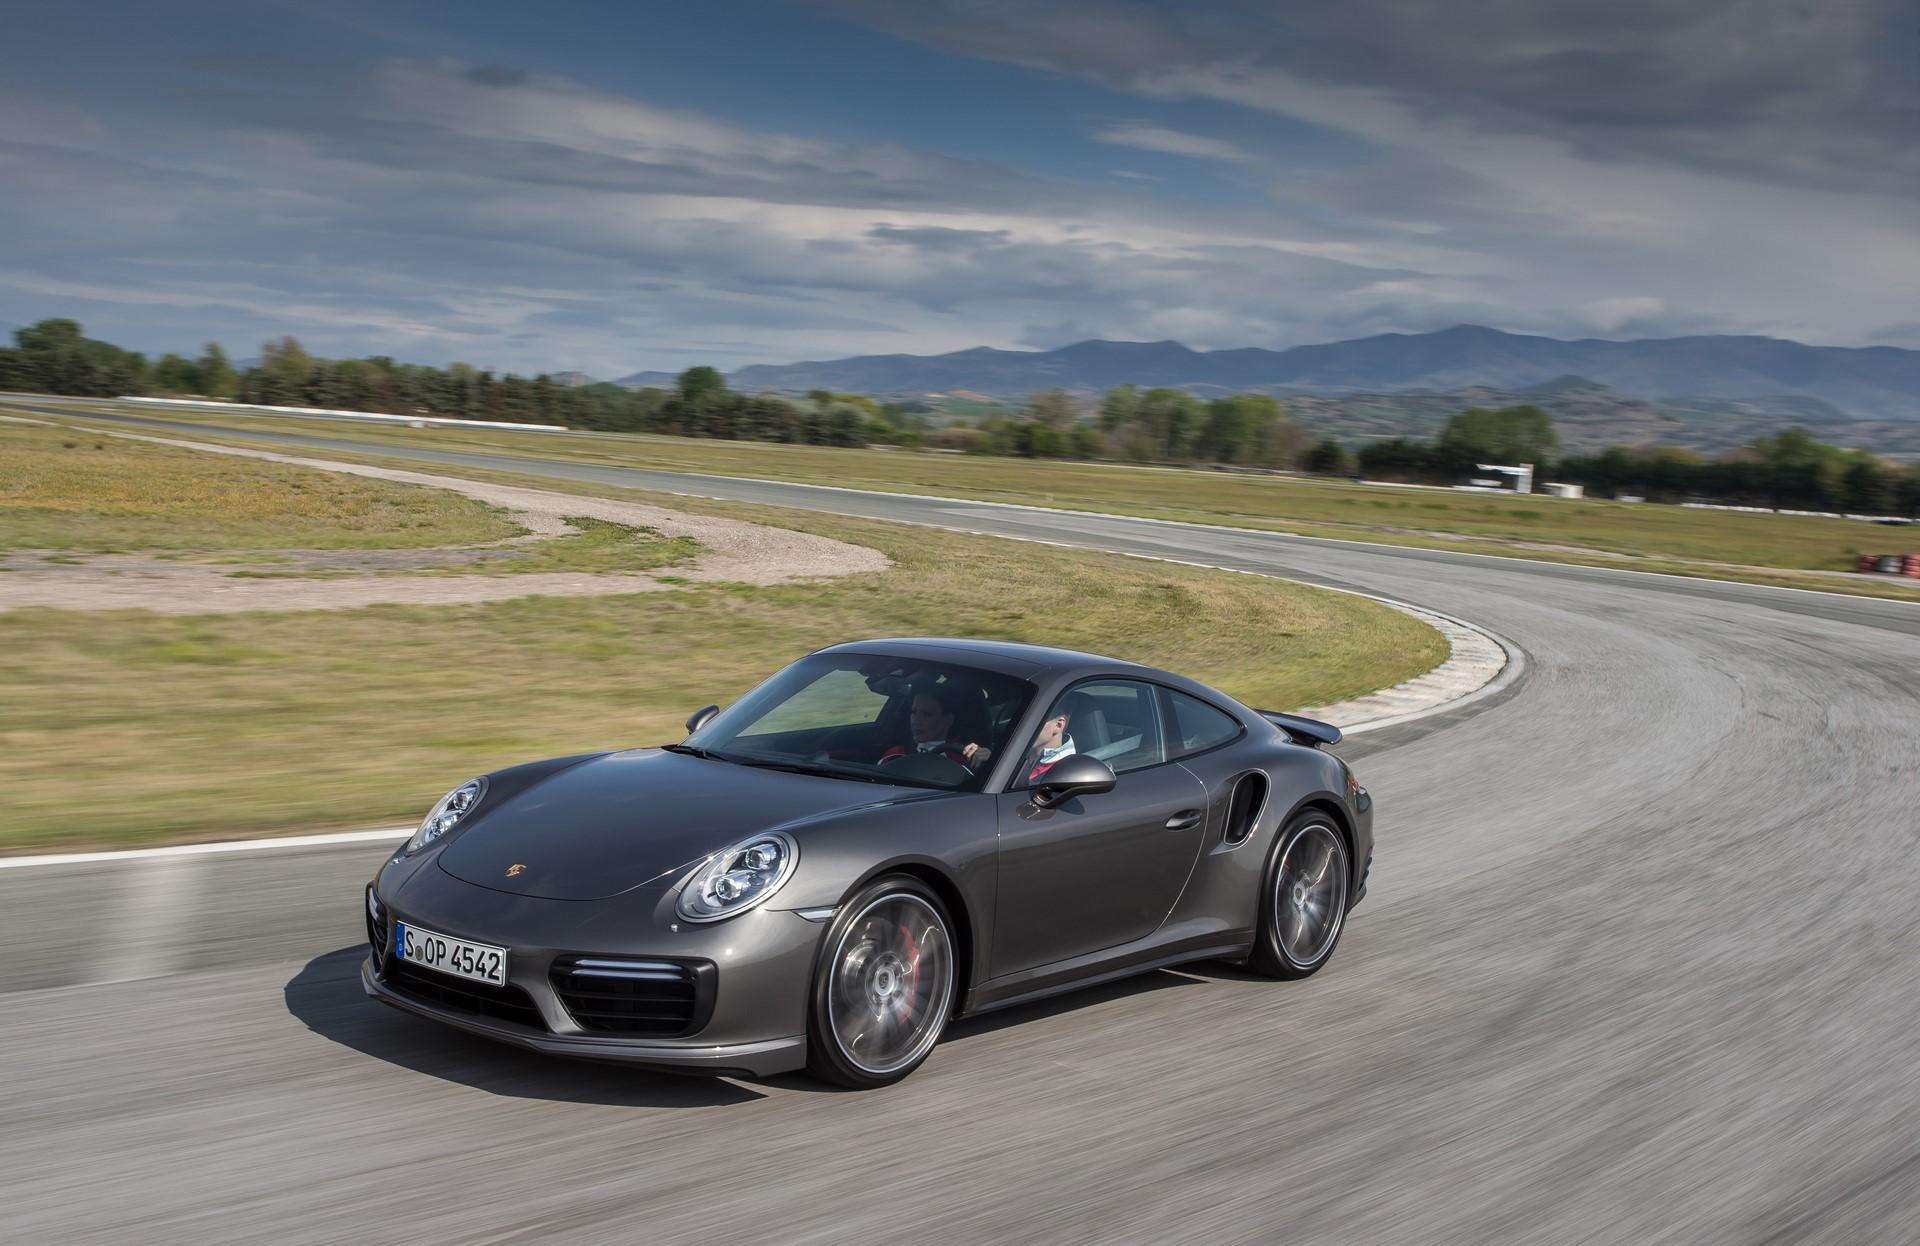 Porsche Driving Experience 2017 Serres (26)